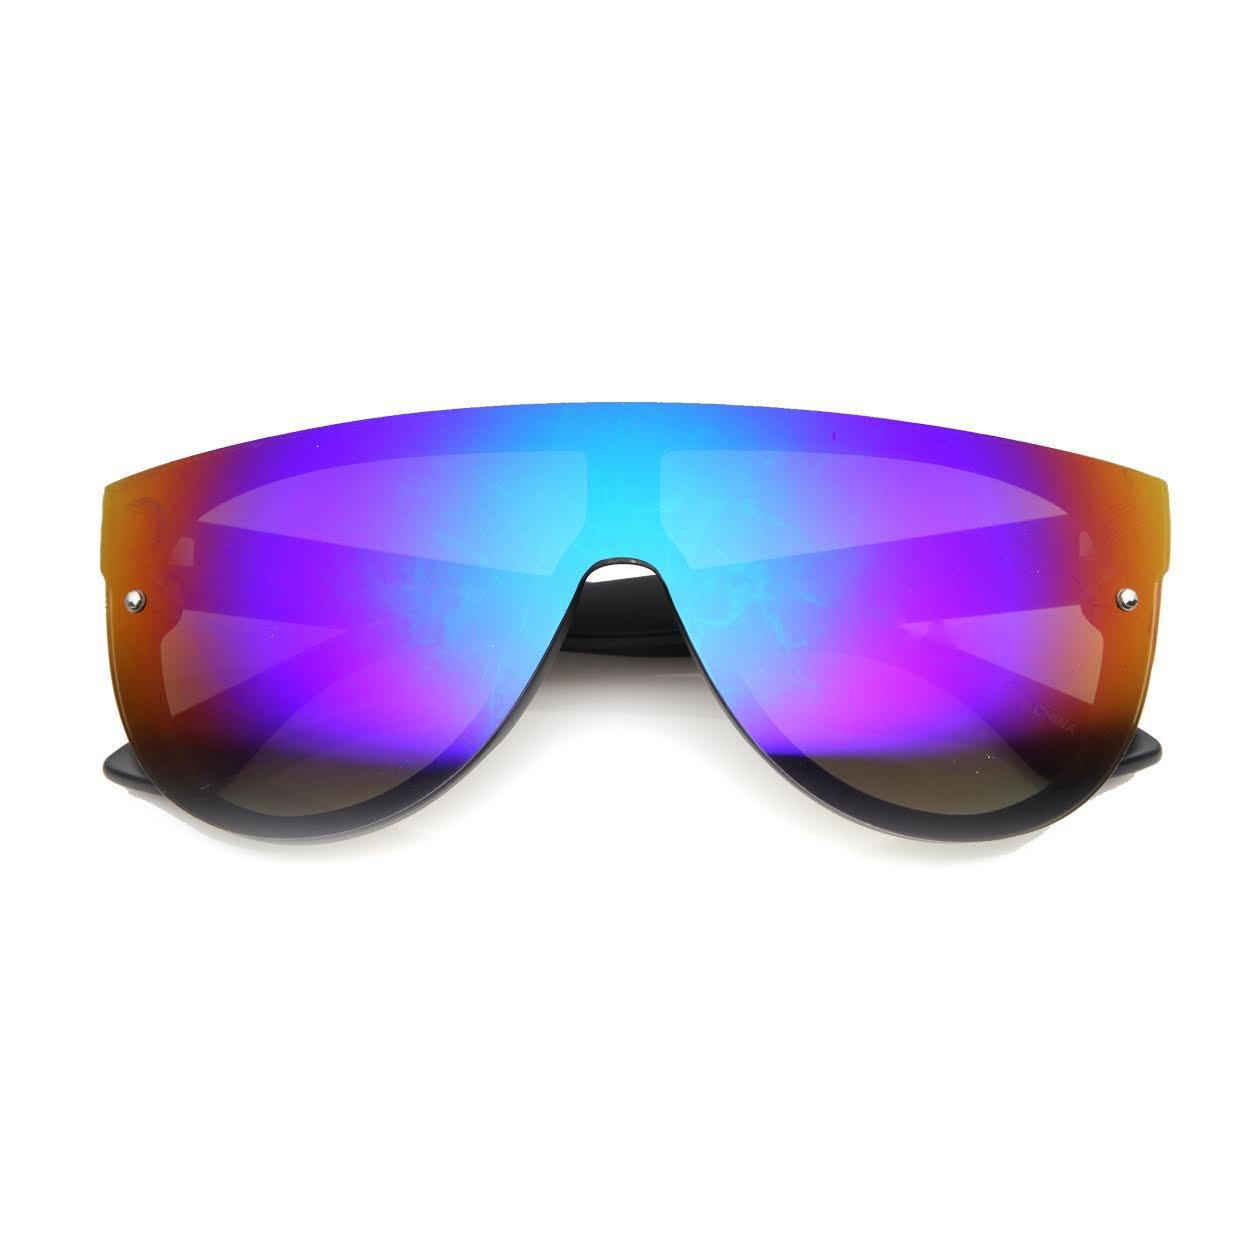 MODERN VICE Iridescent Sunglasses at FLYJANE